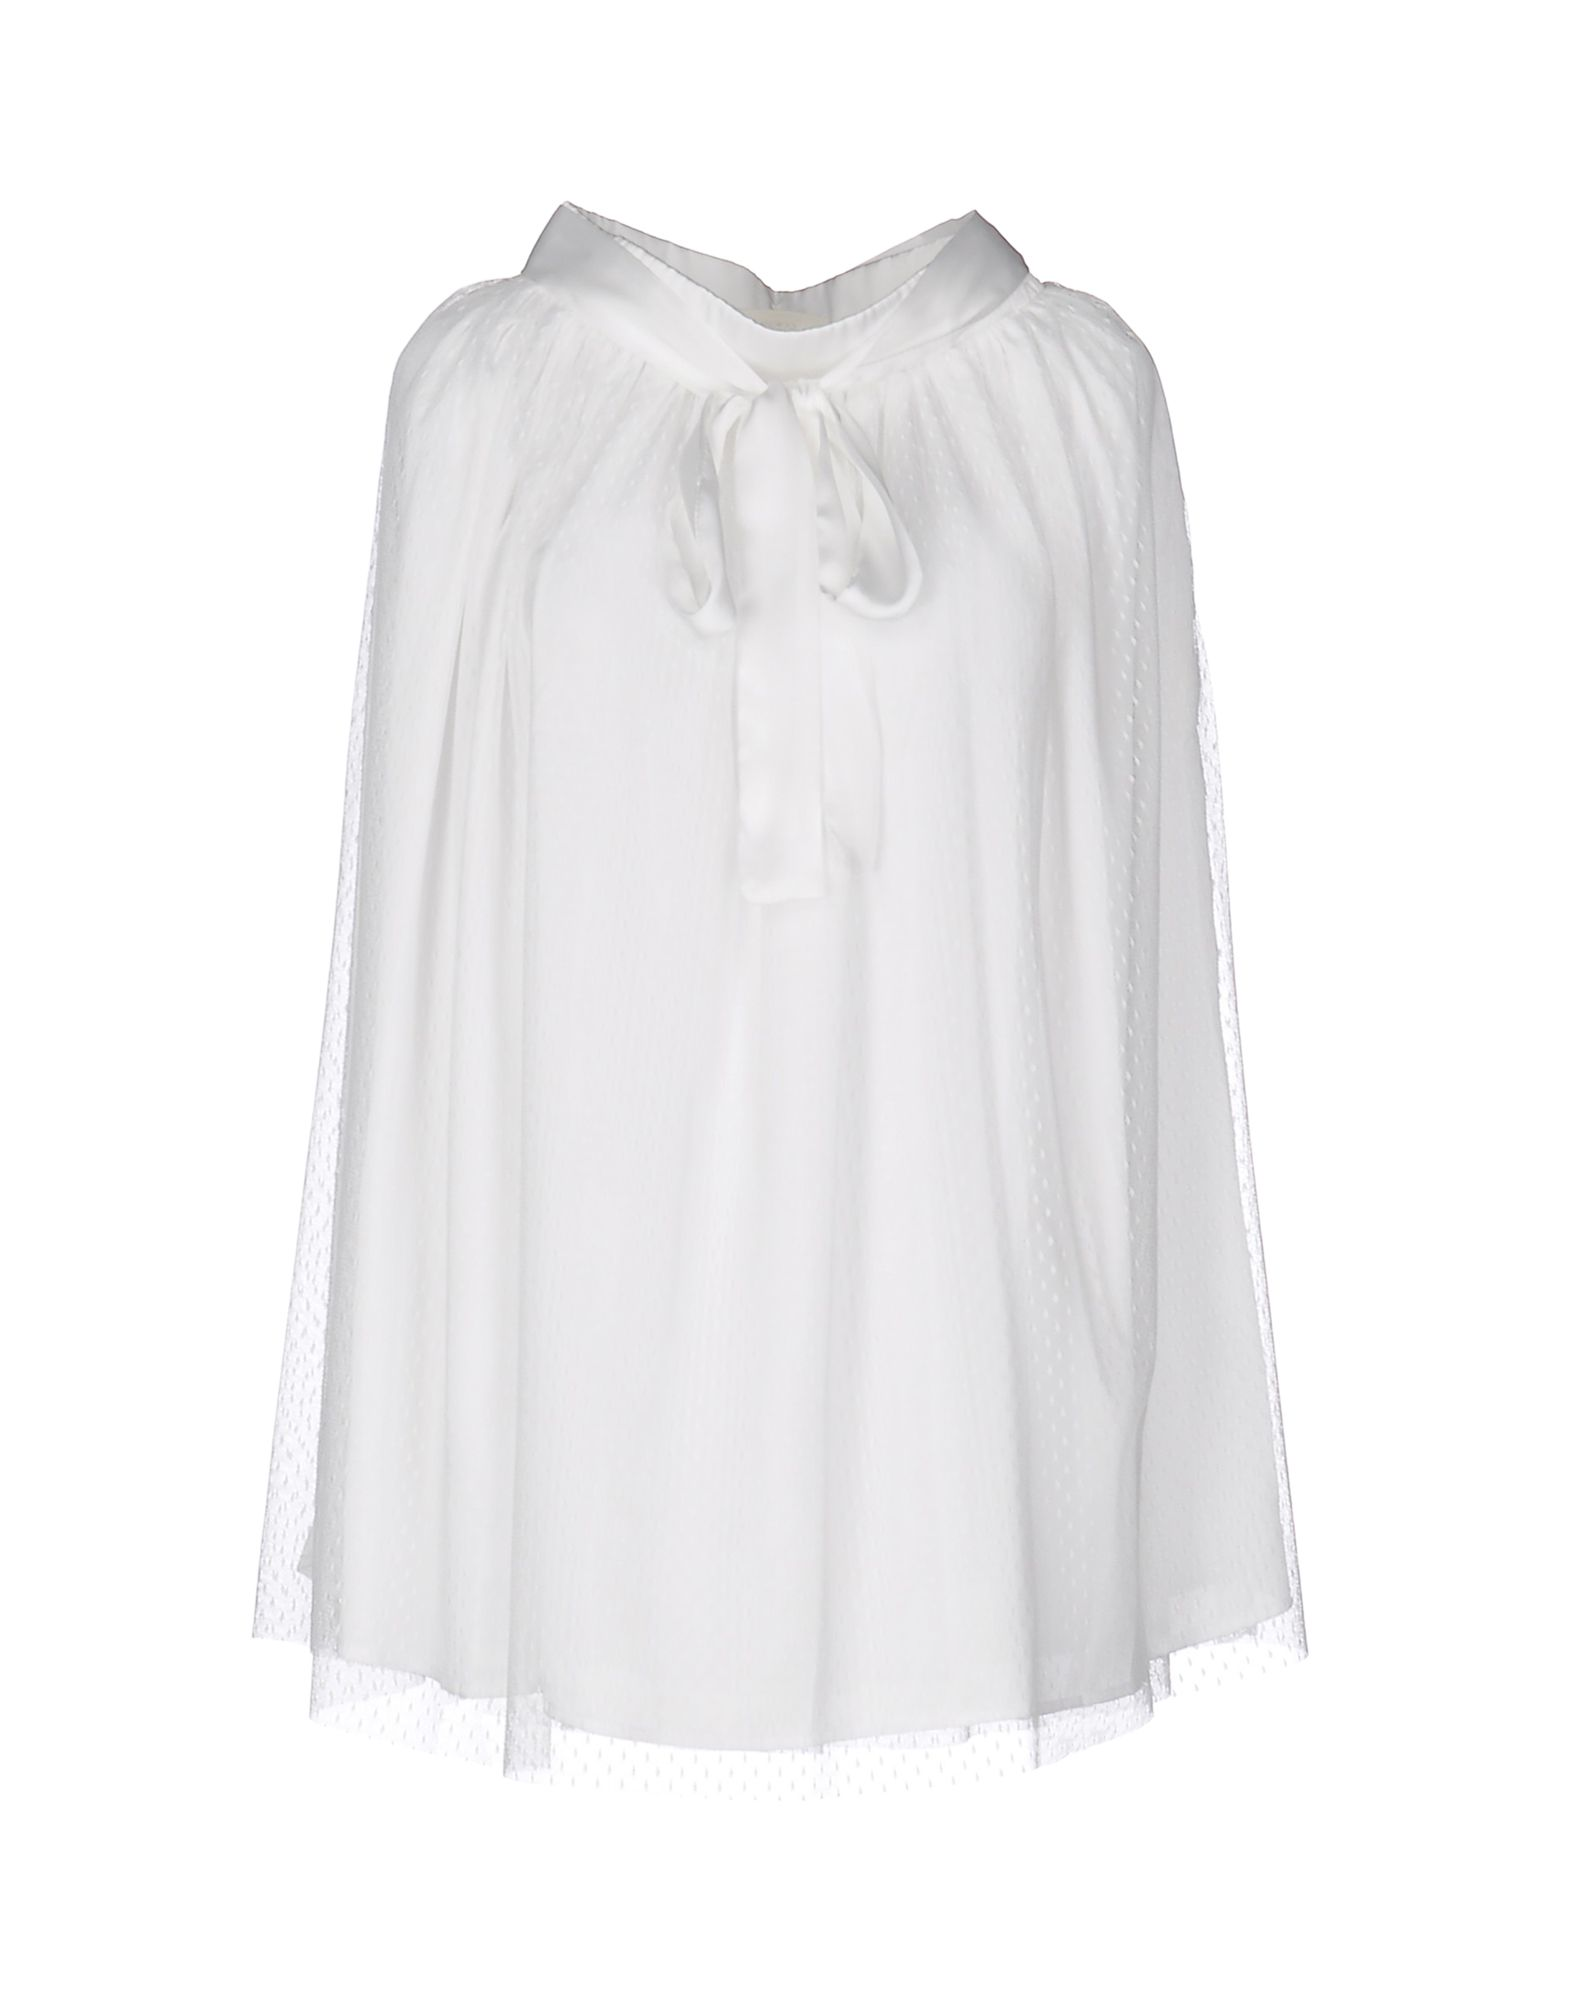 VICOLO Юбка длиной 3/4 moschino couture юбка длиной 3 4